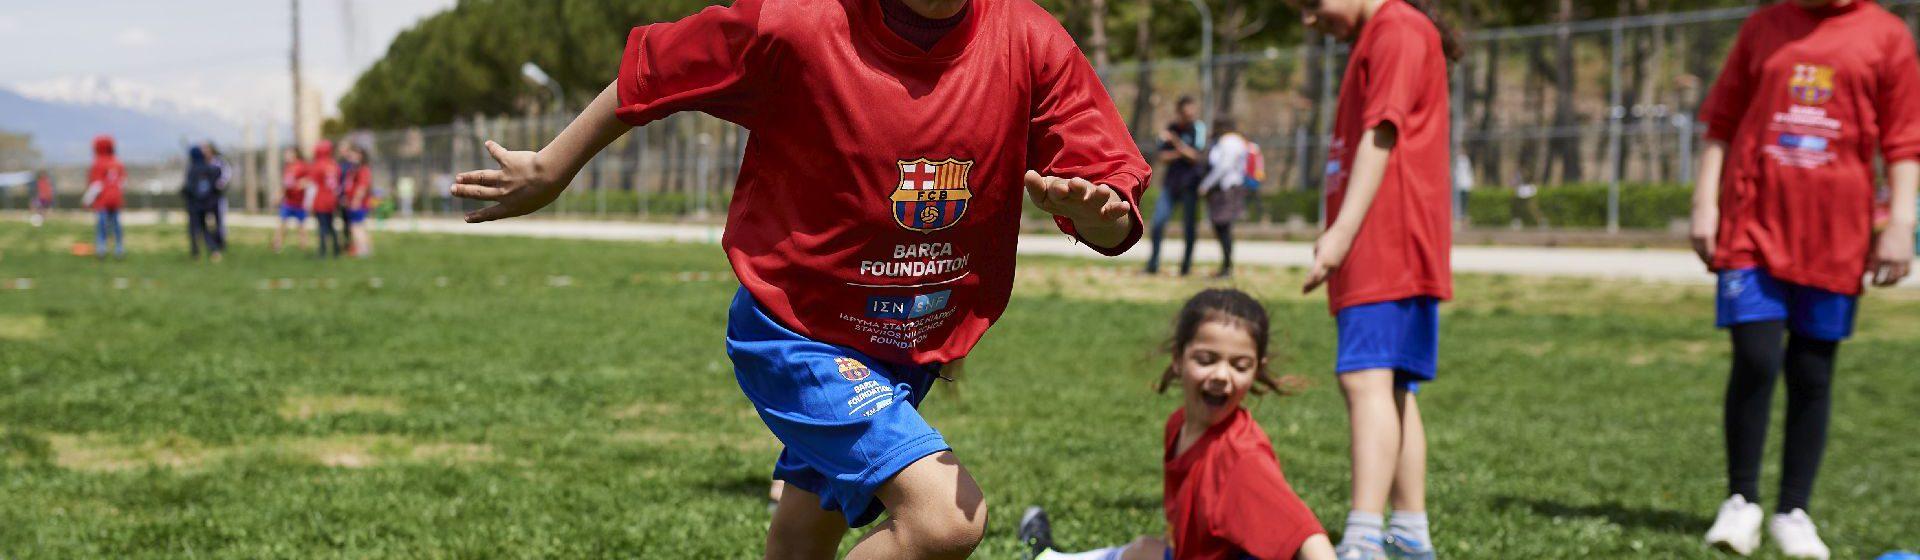 Barça Foundation header